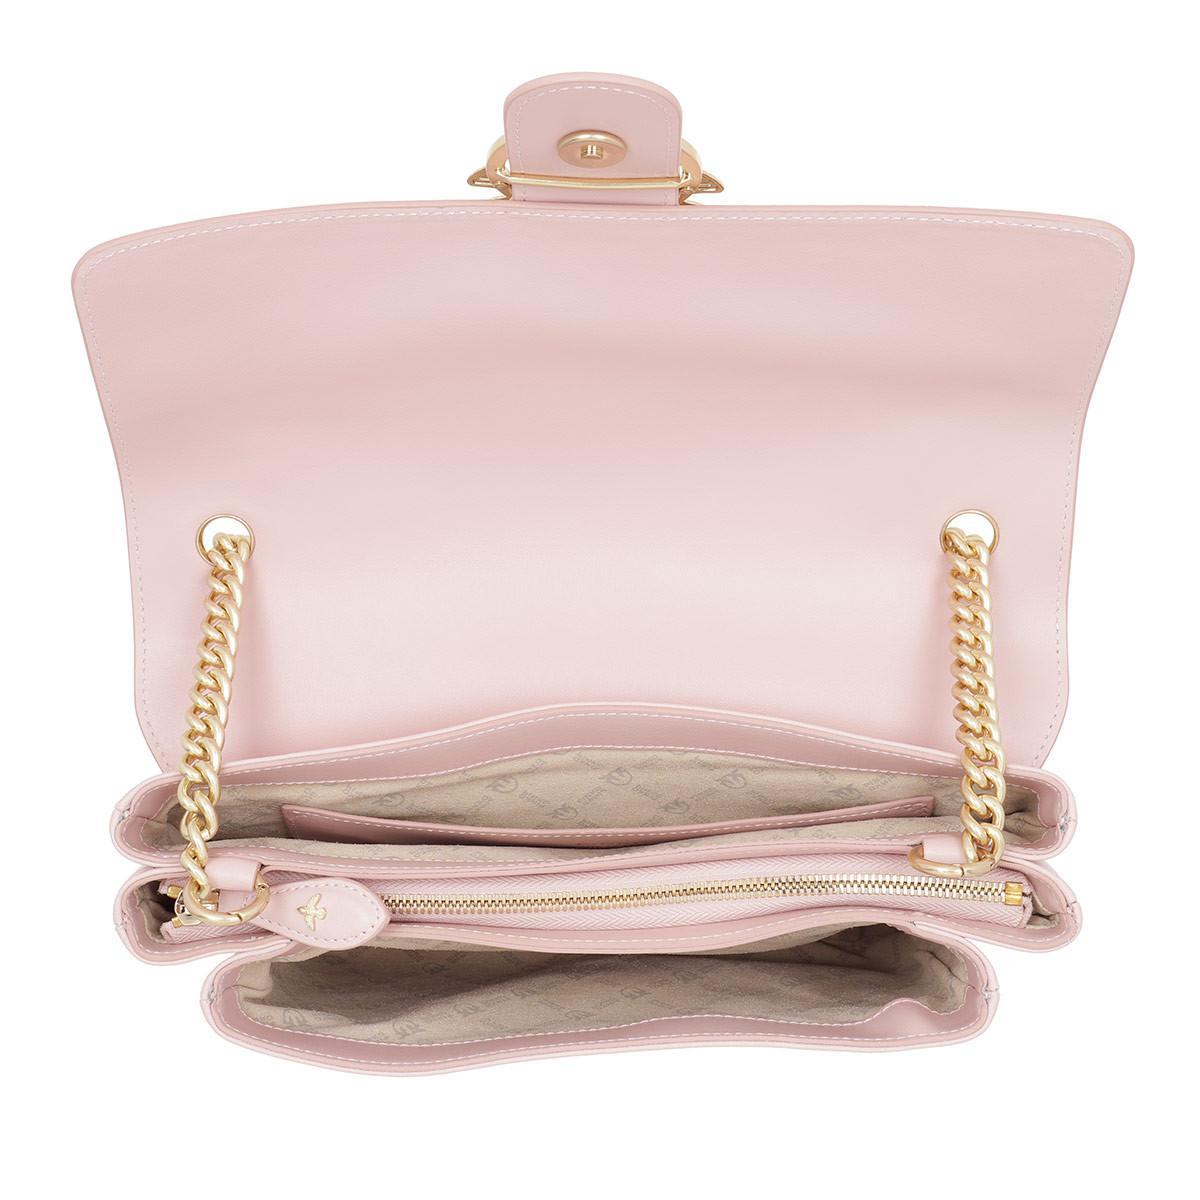 Pinko Leather Big Love Simply Crossbody Bag Rosa Chiaro in Rose (Pink)